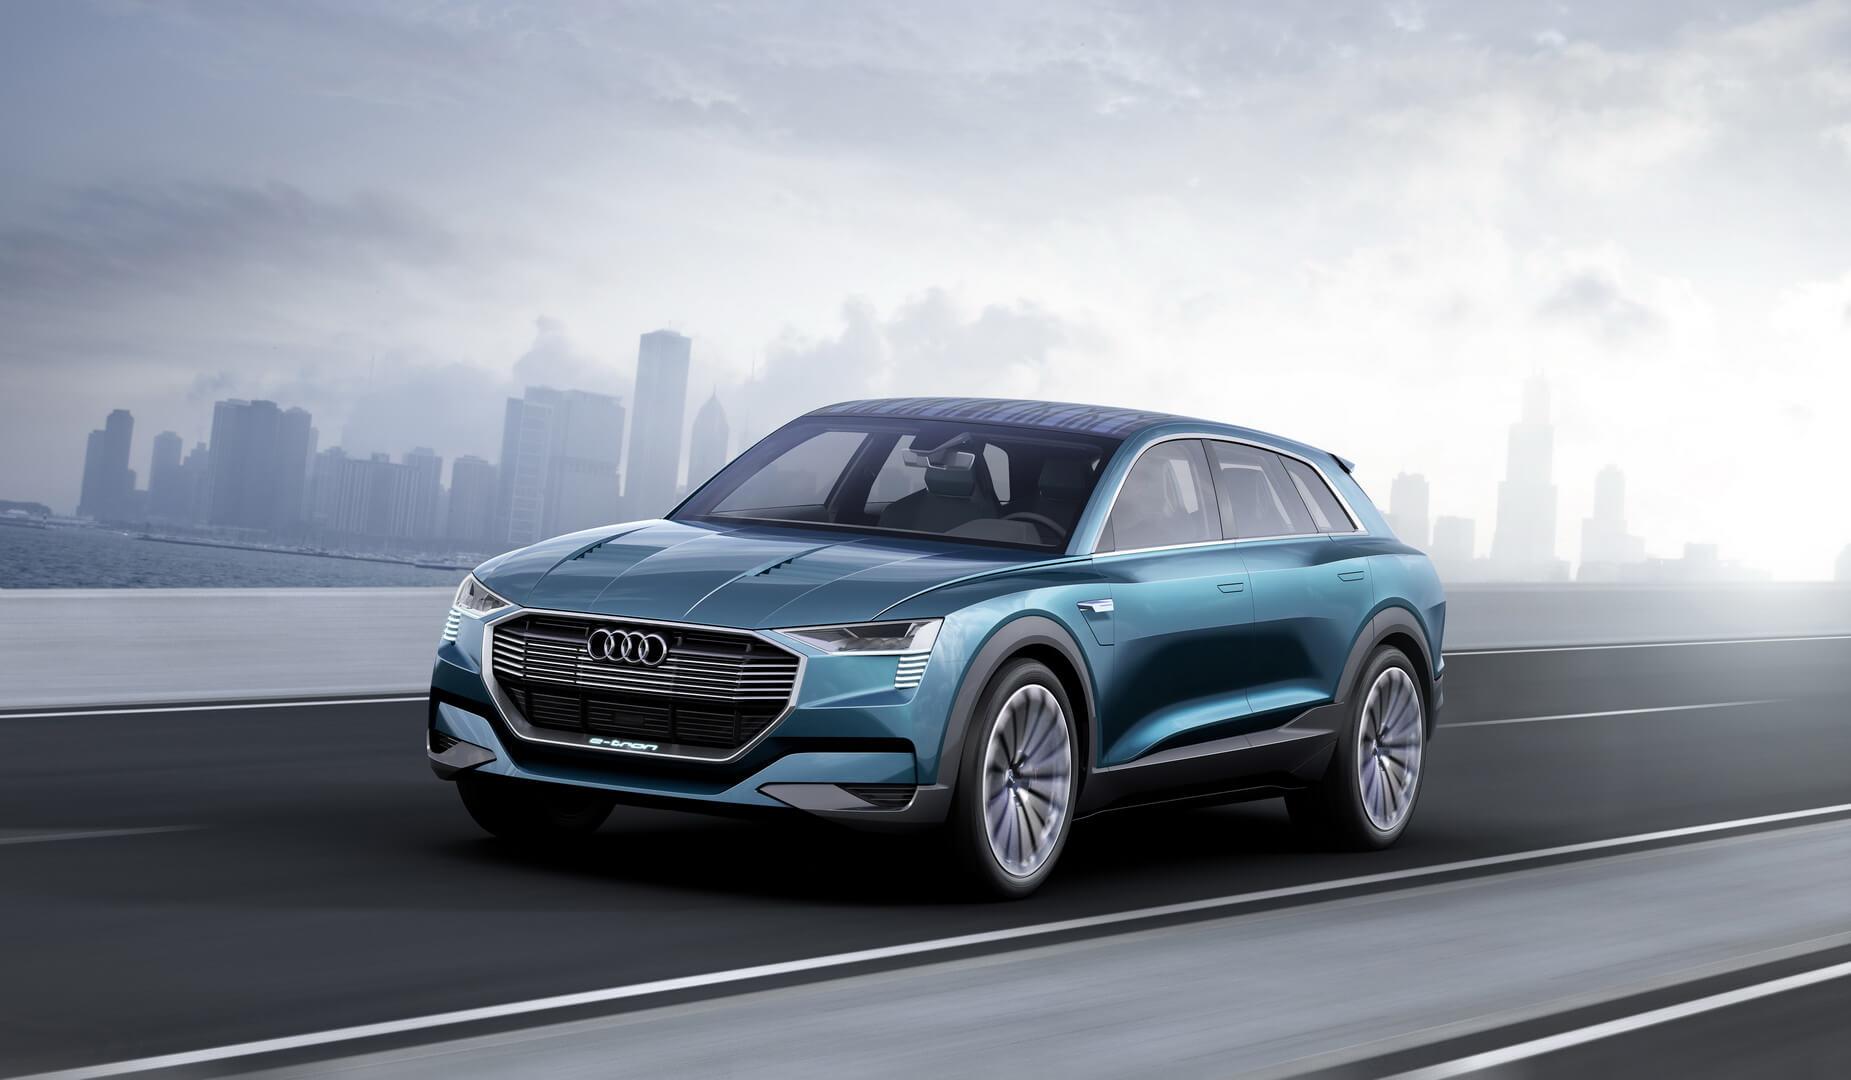 Автомобиль Audi e-tron quattro